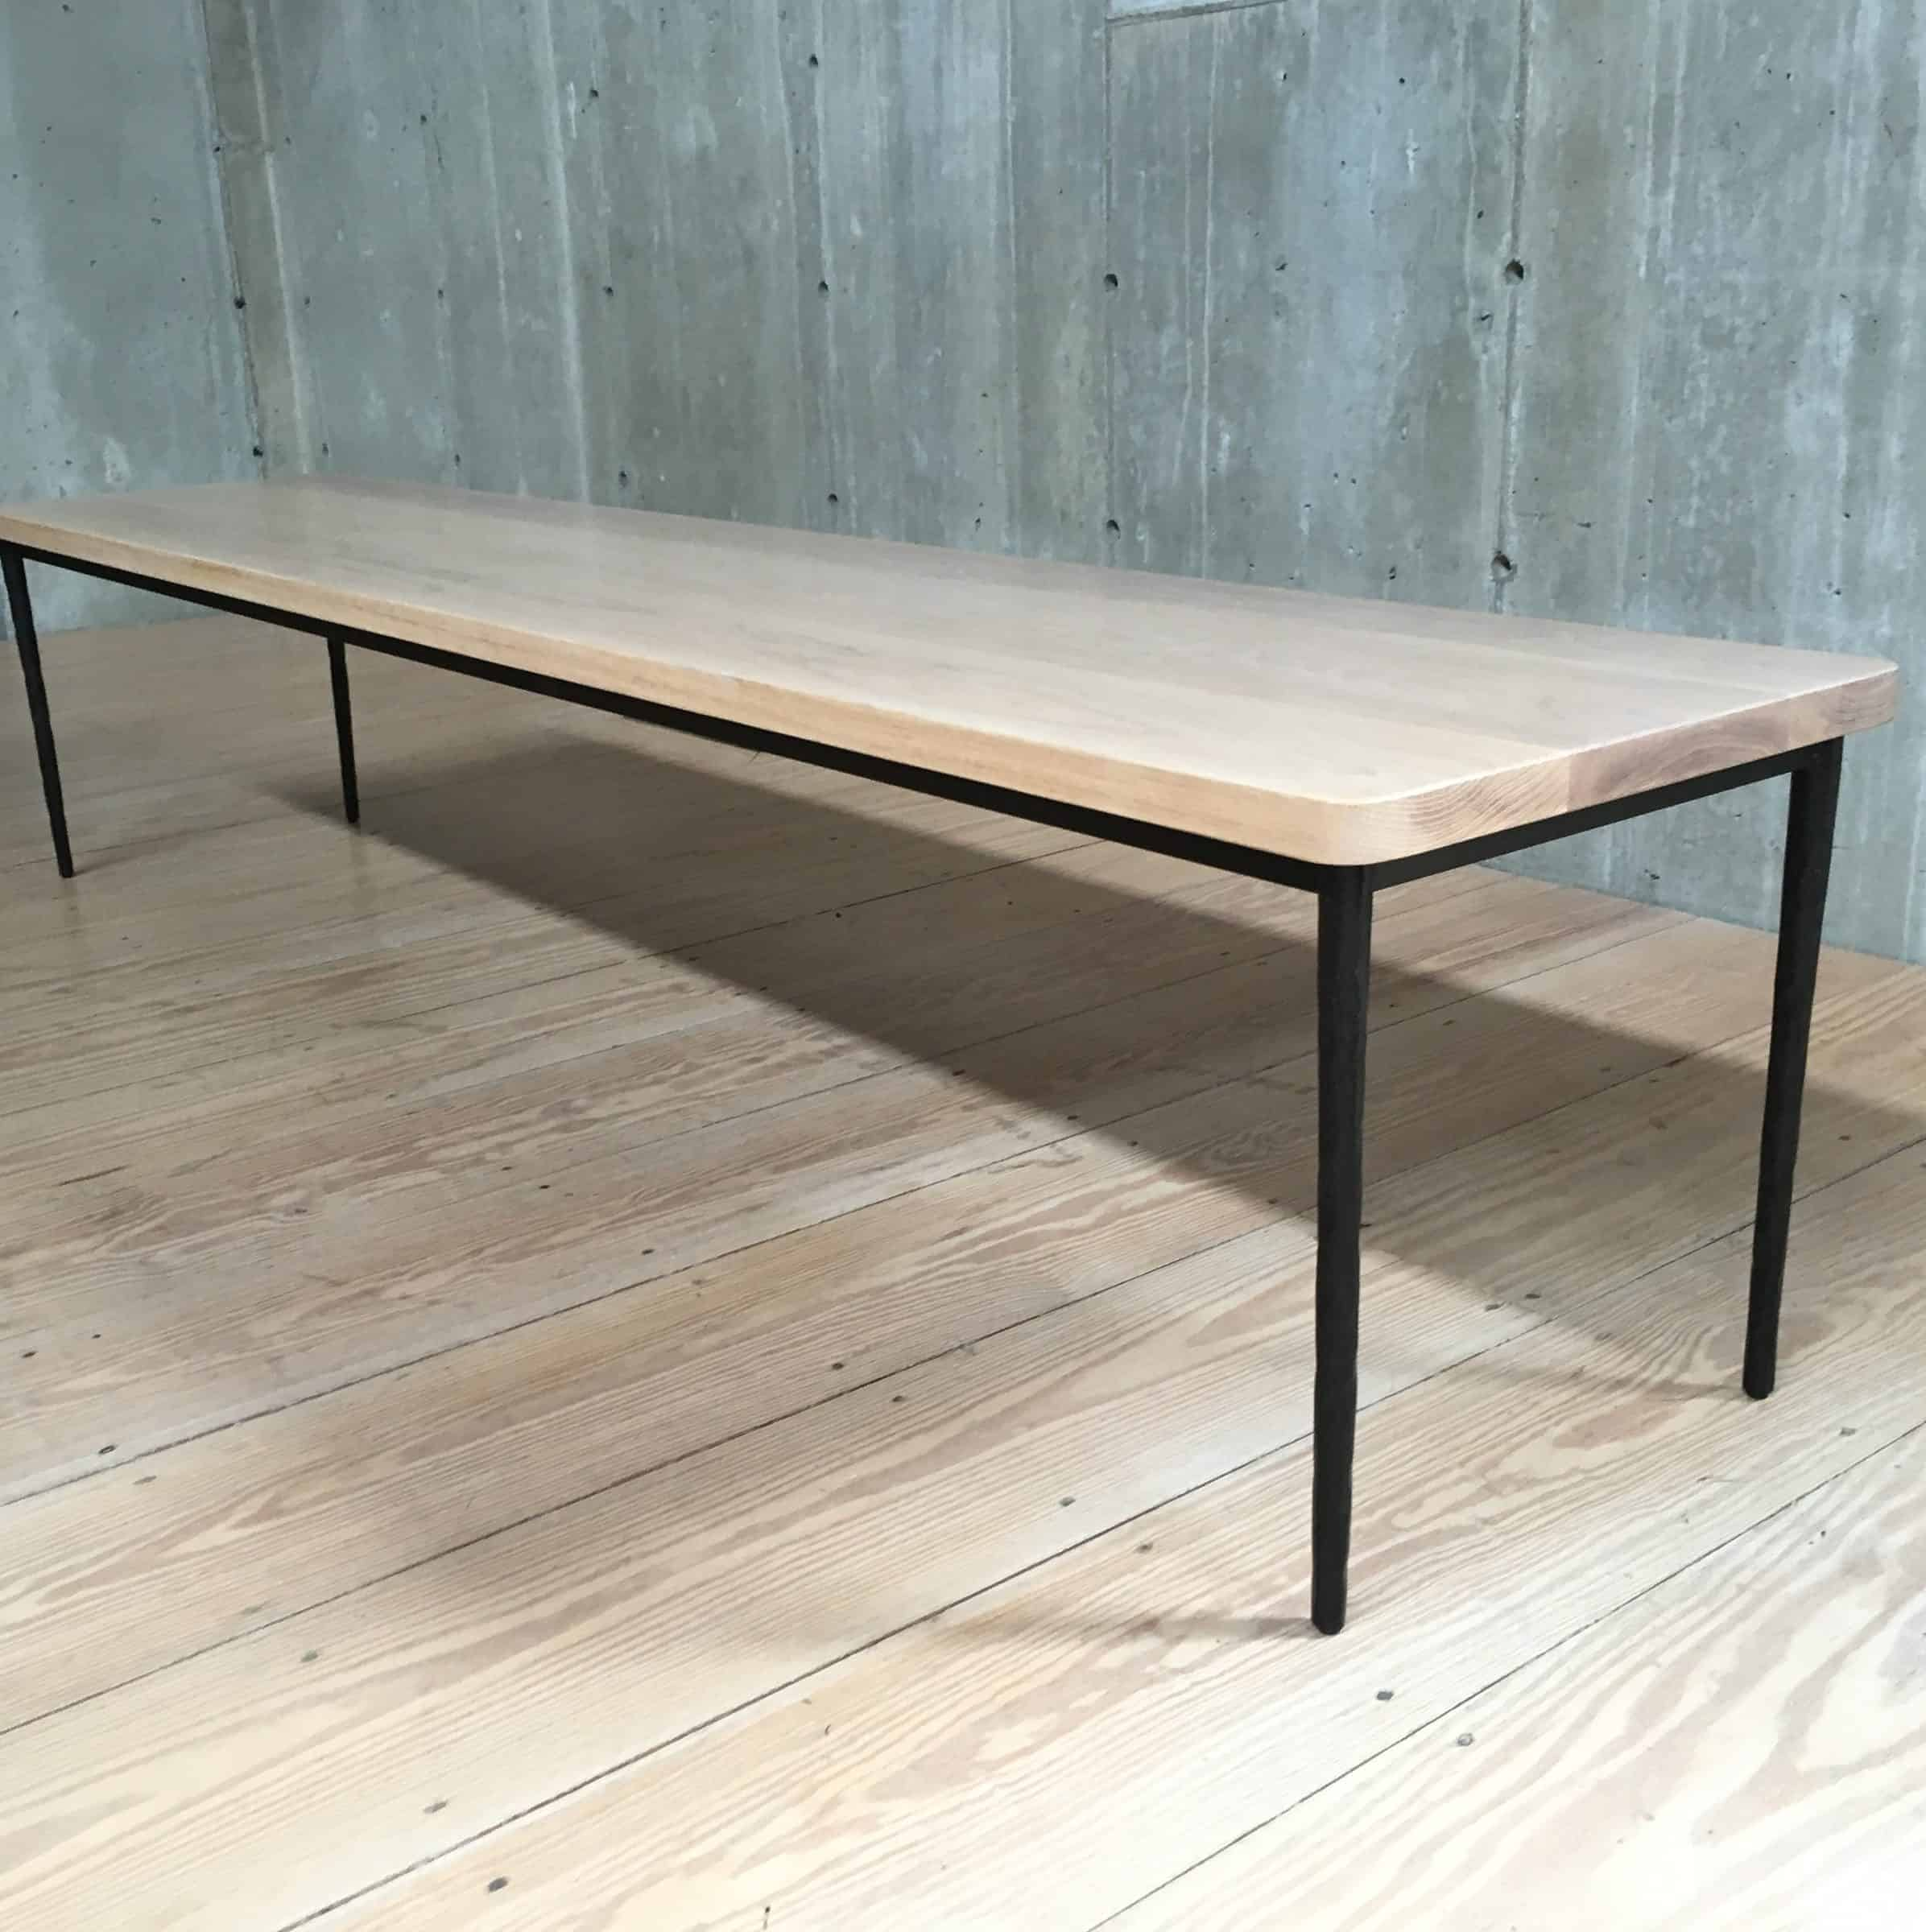 IMG_3418. IMG_3420. IMG_3425. IMG_3437. Dark Oak Table